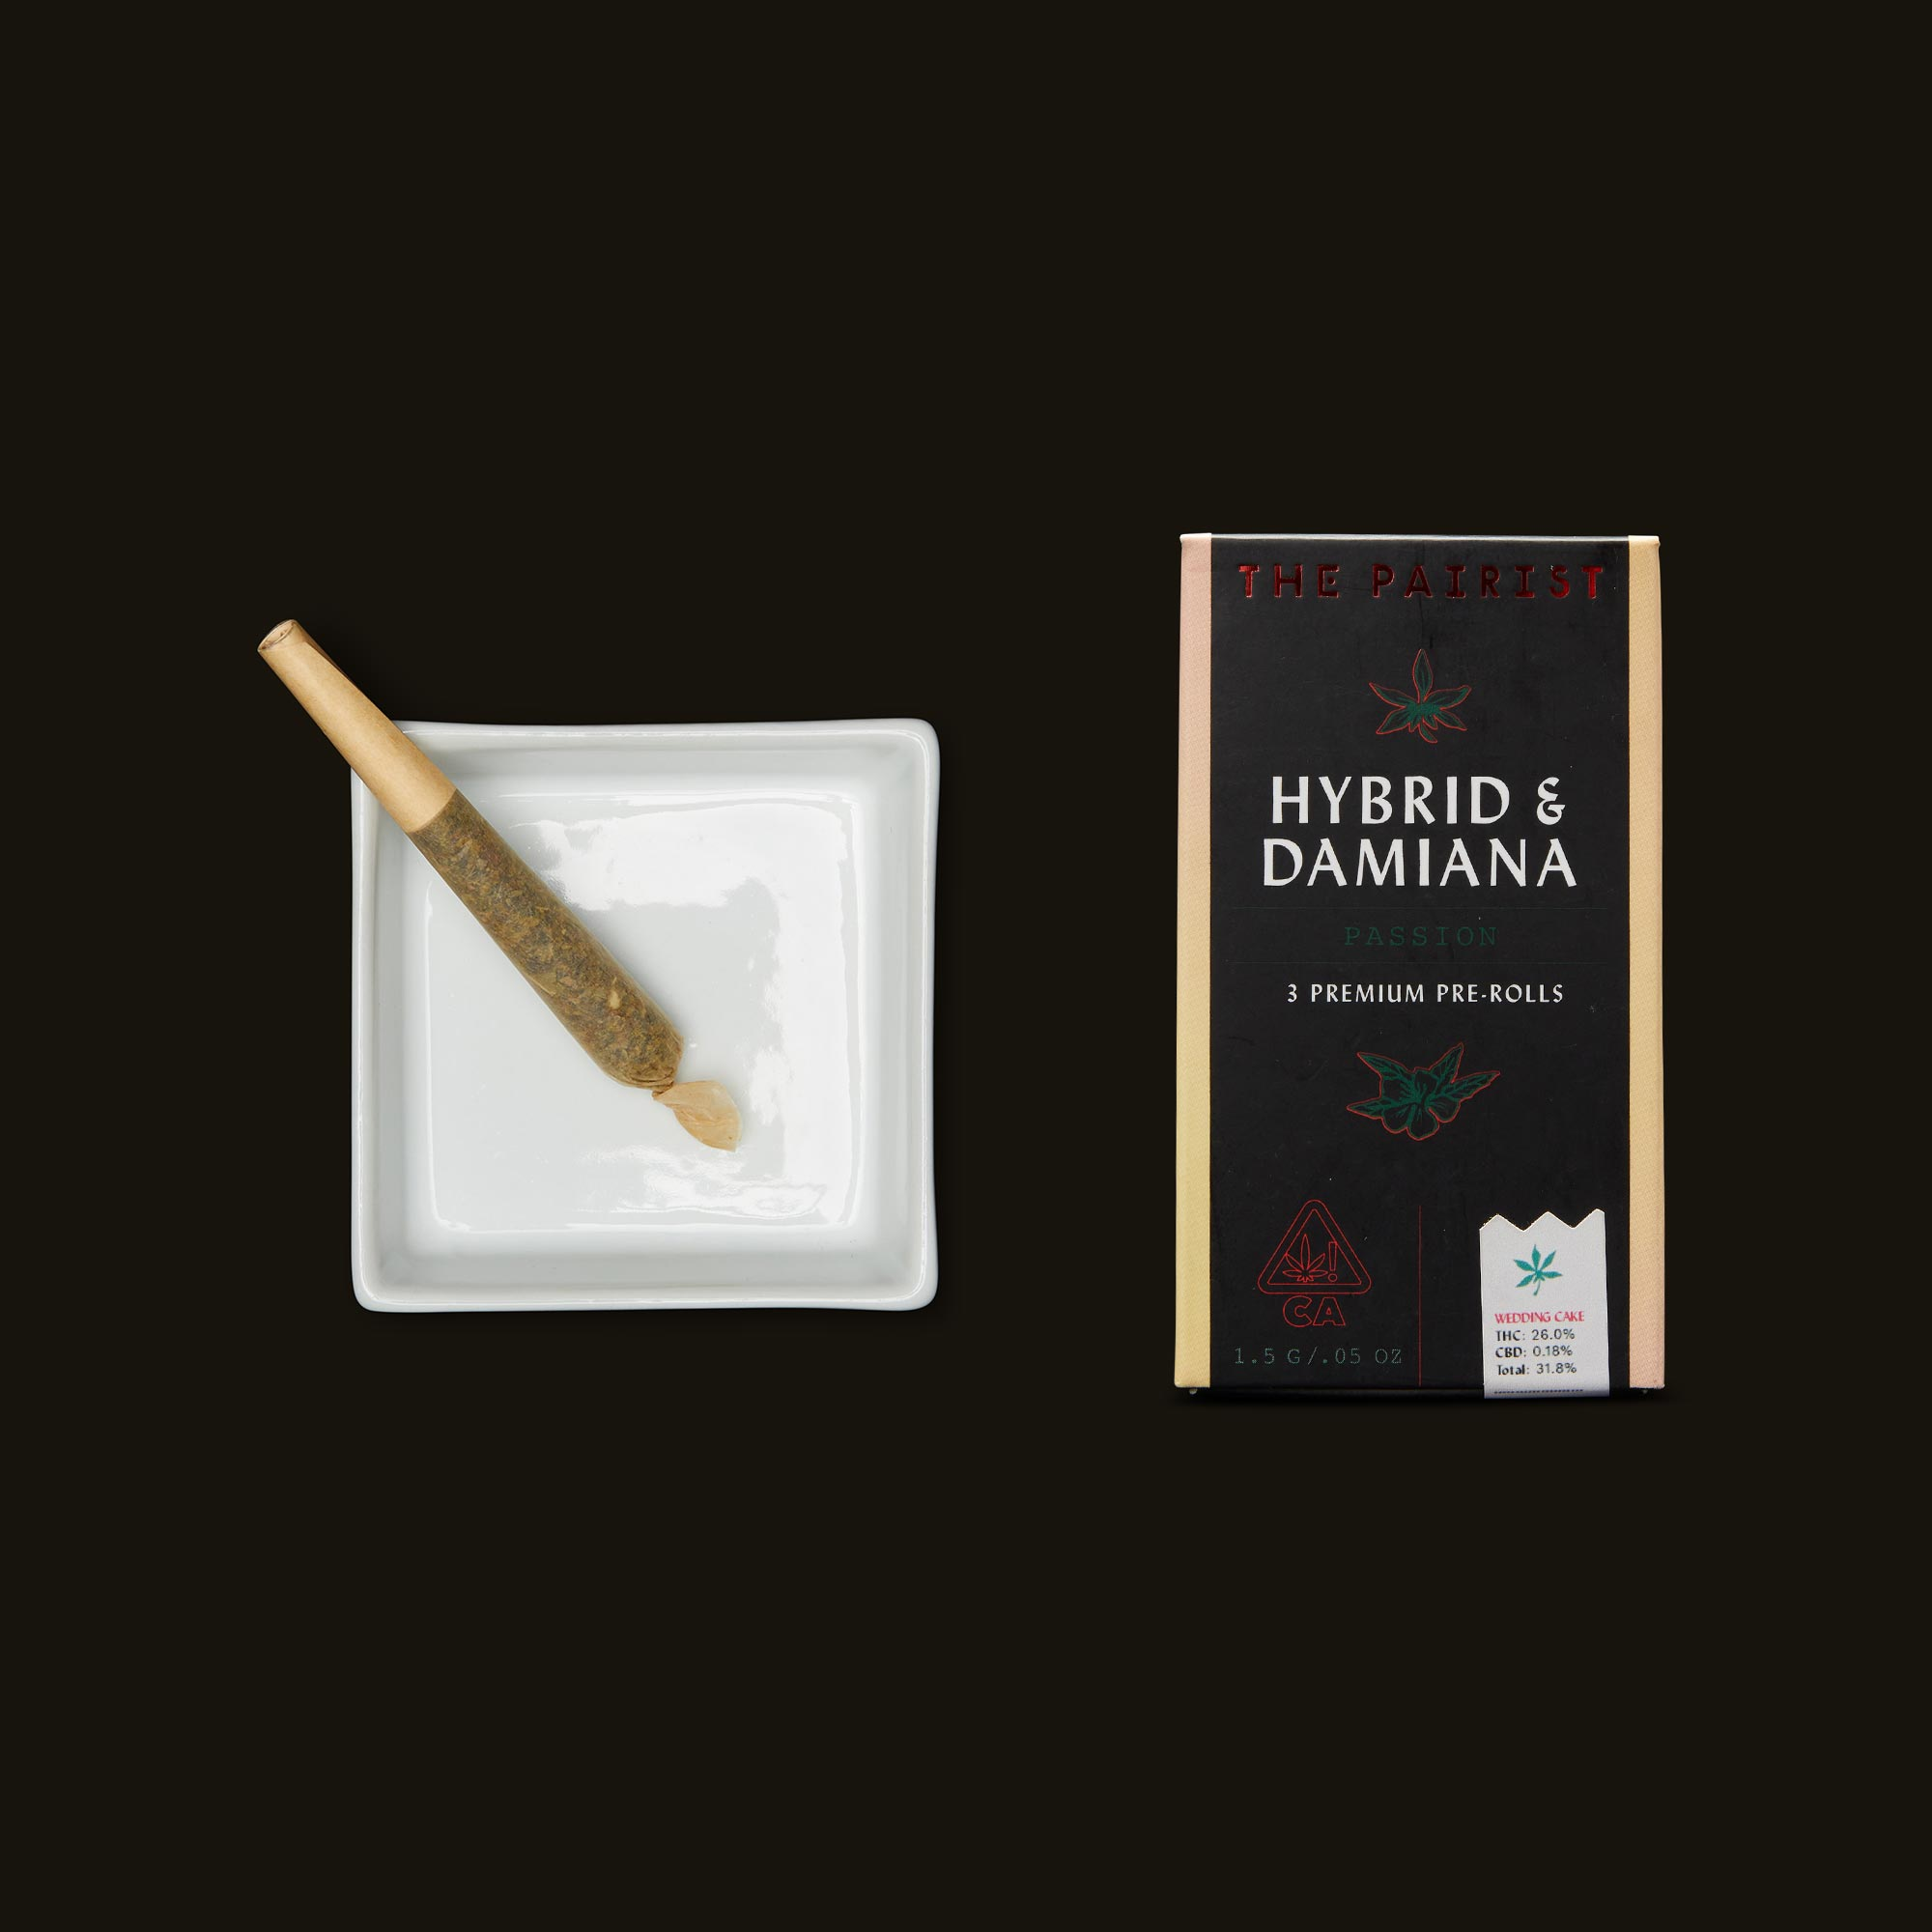 Hybrid & Damiana Pre-Rolls by The Pairist